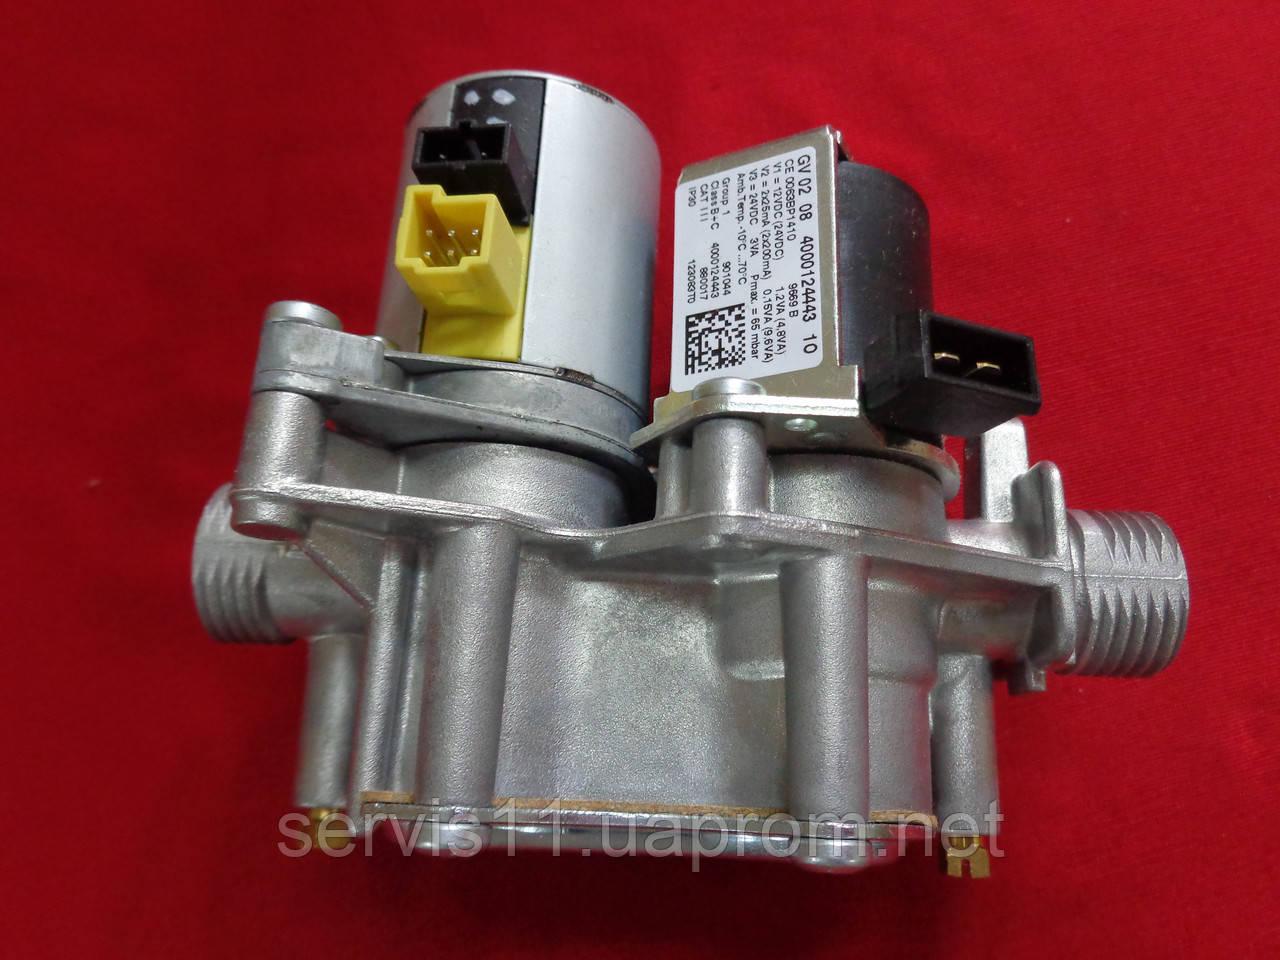 Газовый клапан Honeywell VK8515MR4506 Saunier Duval Semia